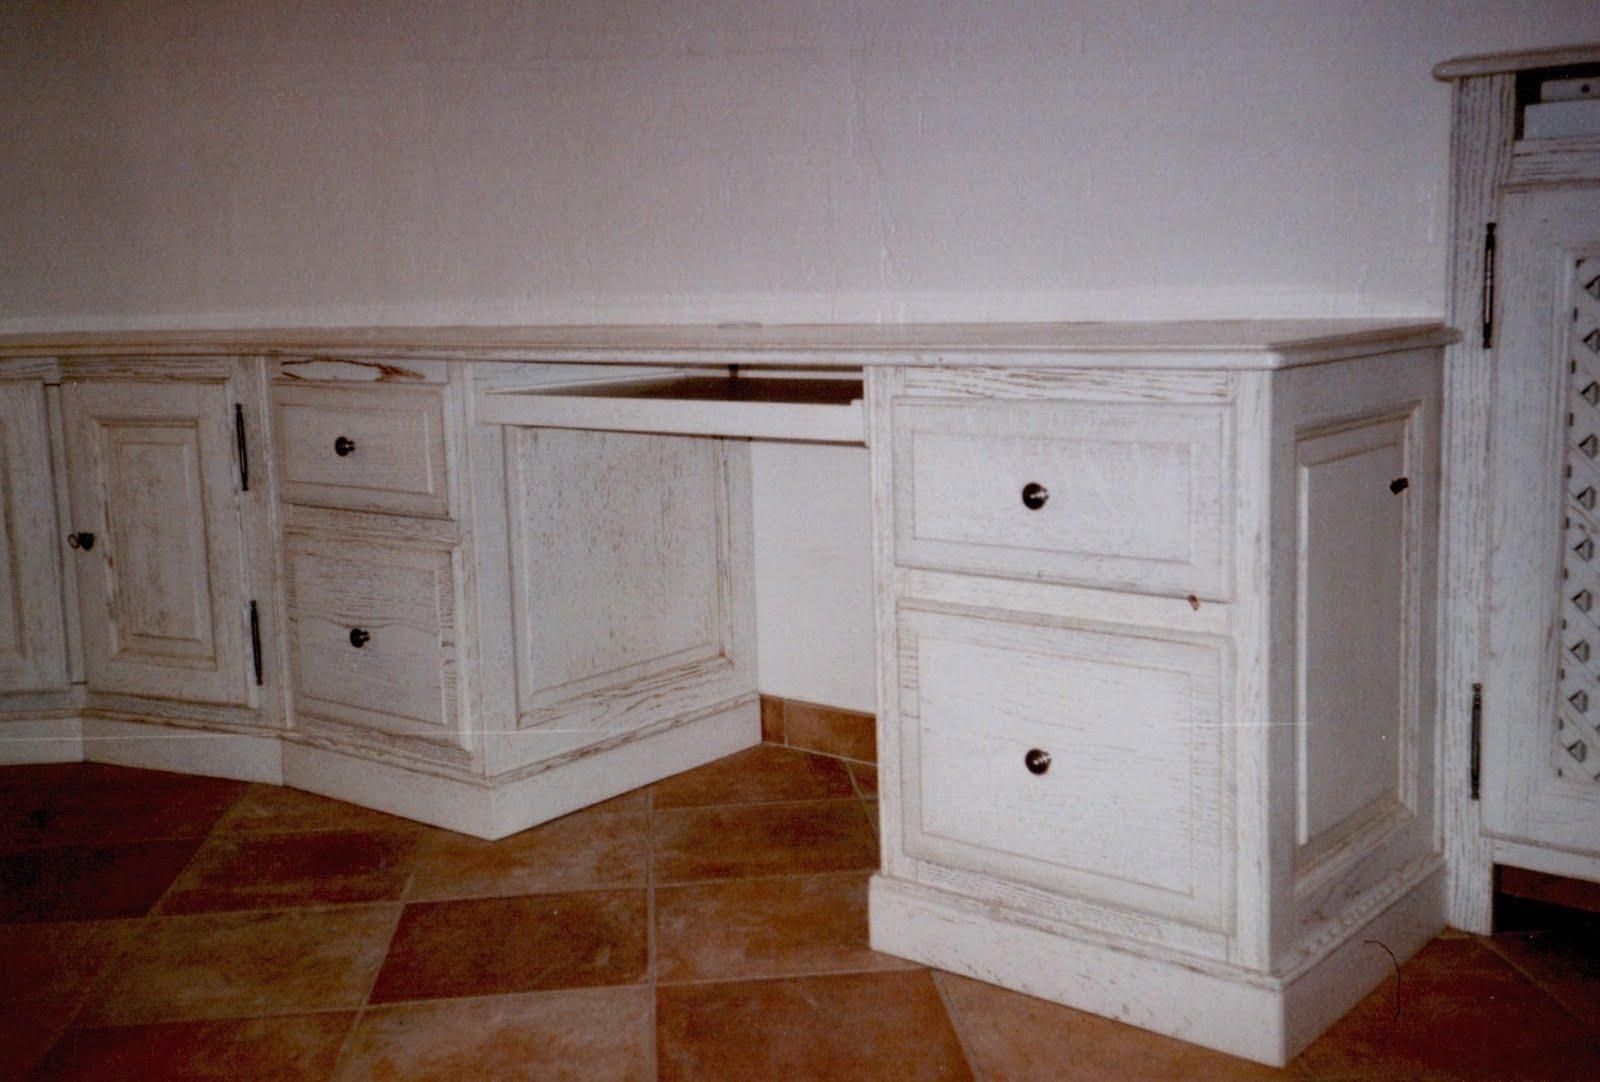 Menuiserie vanin bureau d 39 angle avec tablette r alis e en - Bureau d angle bois massif ...